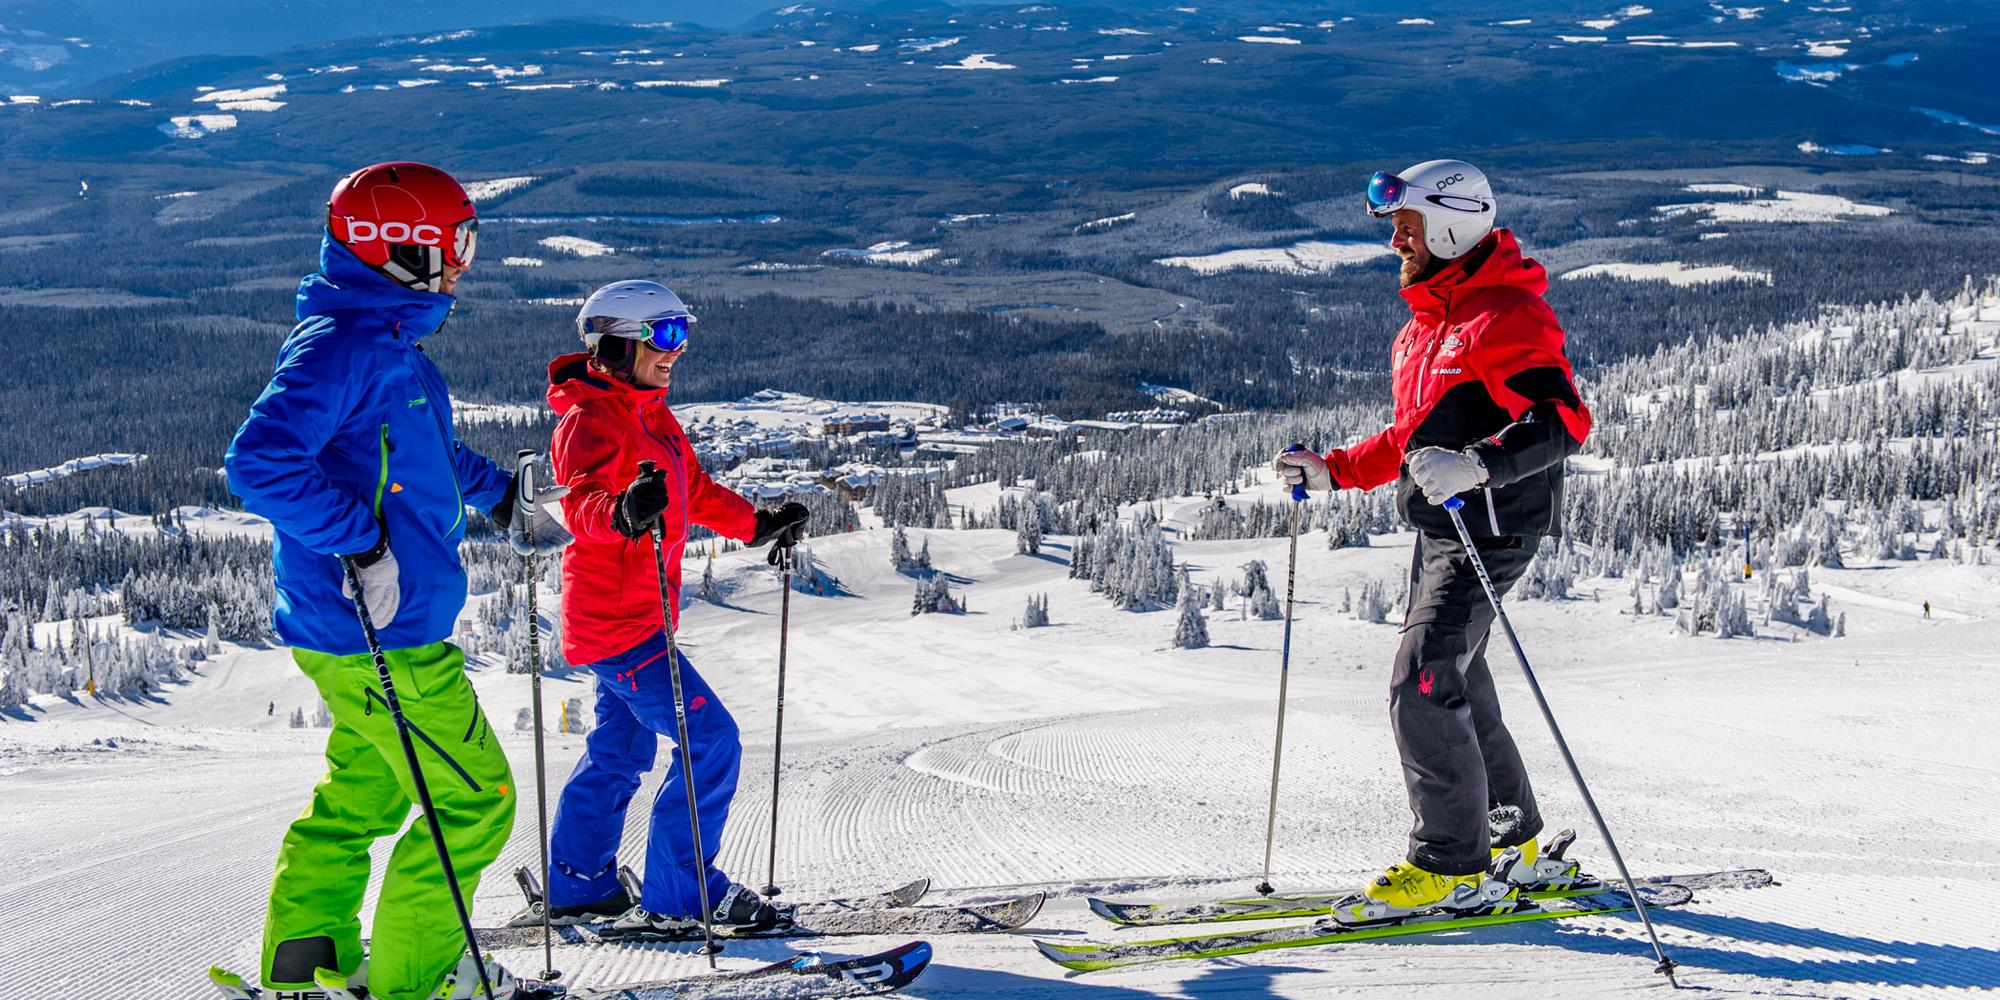 NothinButSnow Ski Instructor Lesson Big White